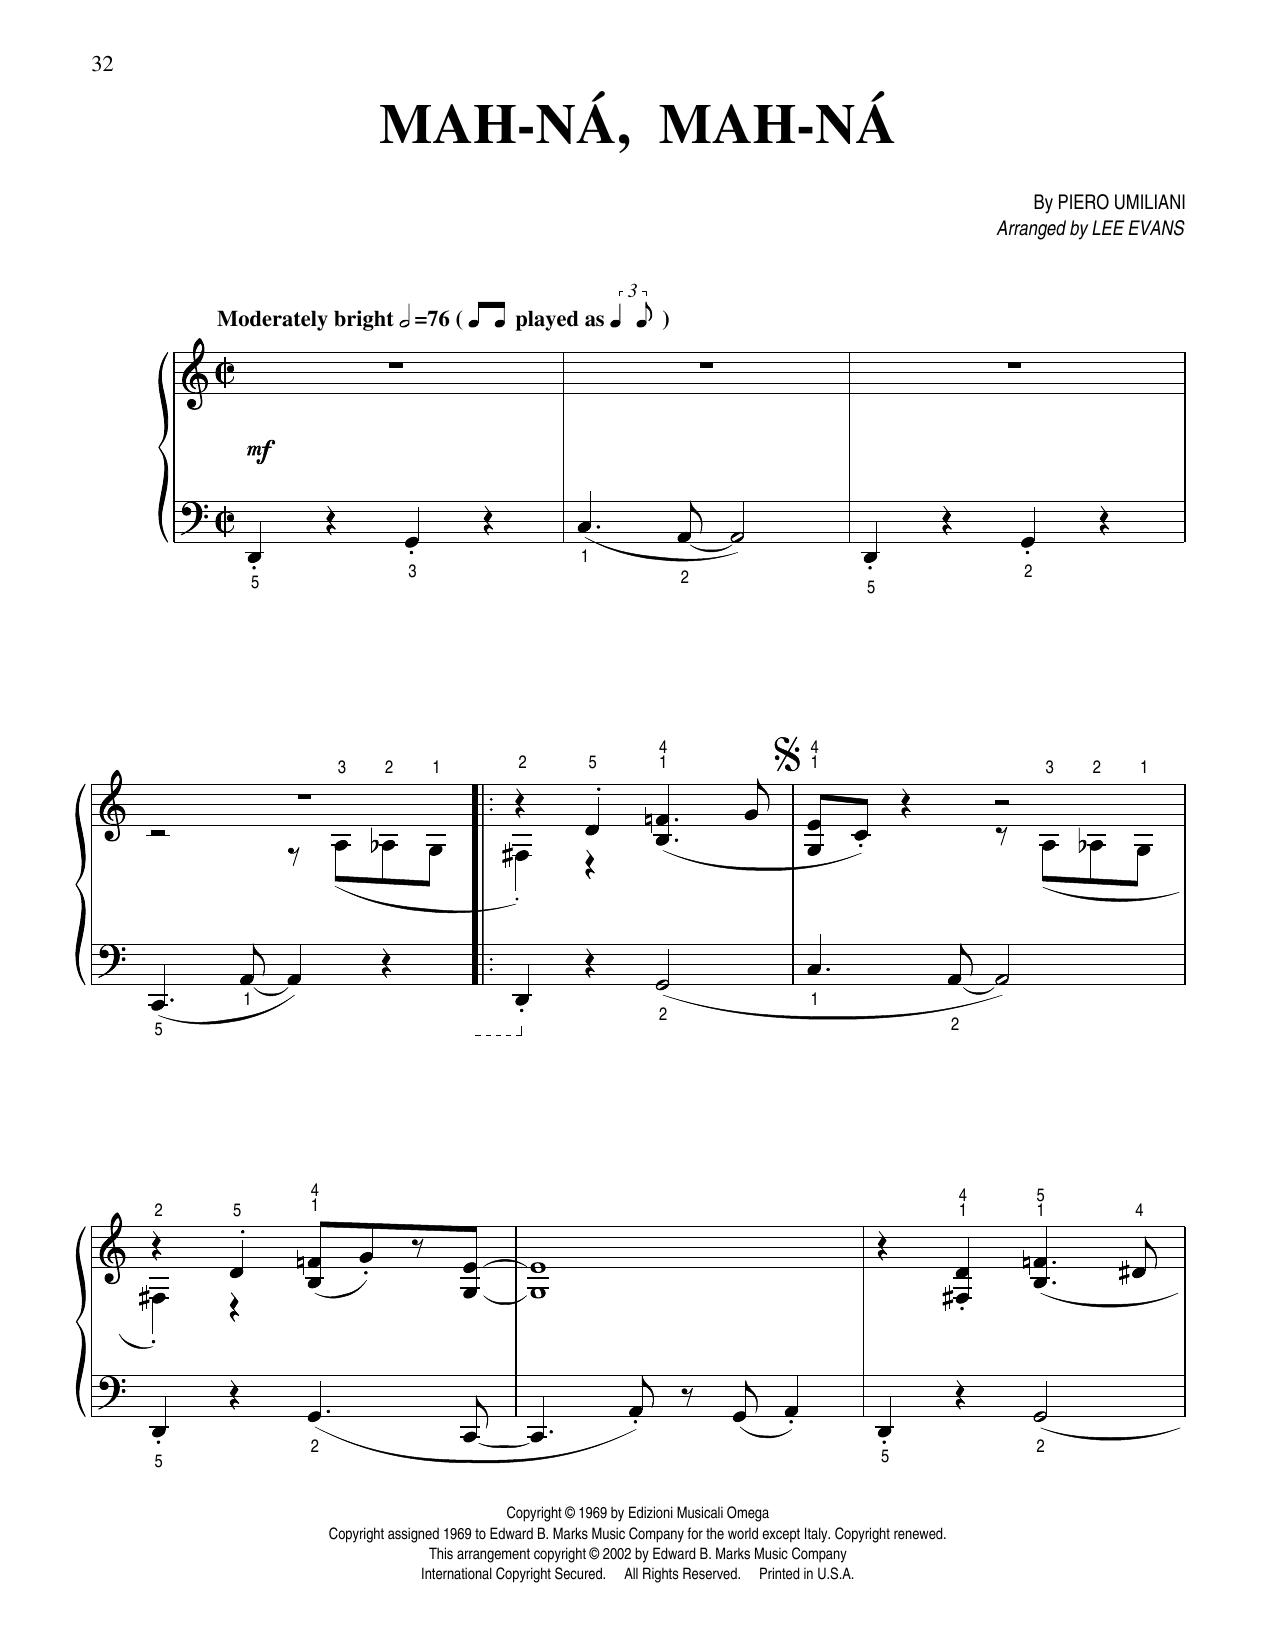 Piero Umiliani Mah-Na Mah-Na (arr. Lee Evans) sheet music notes printable PDF score